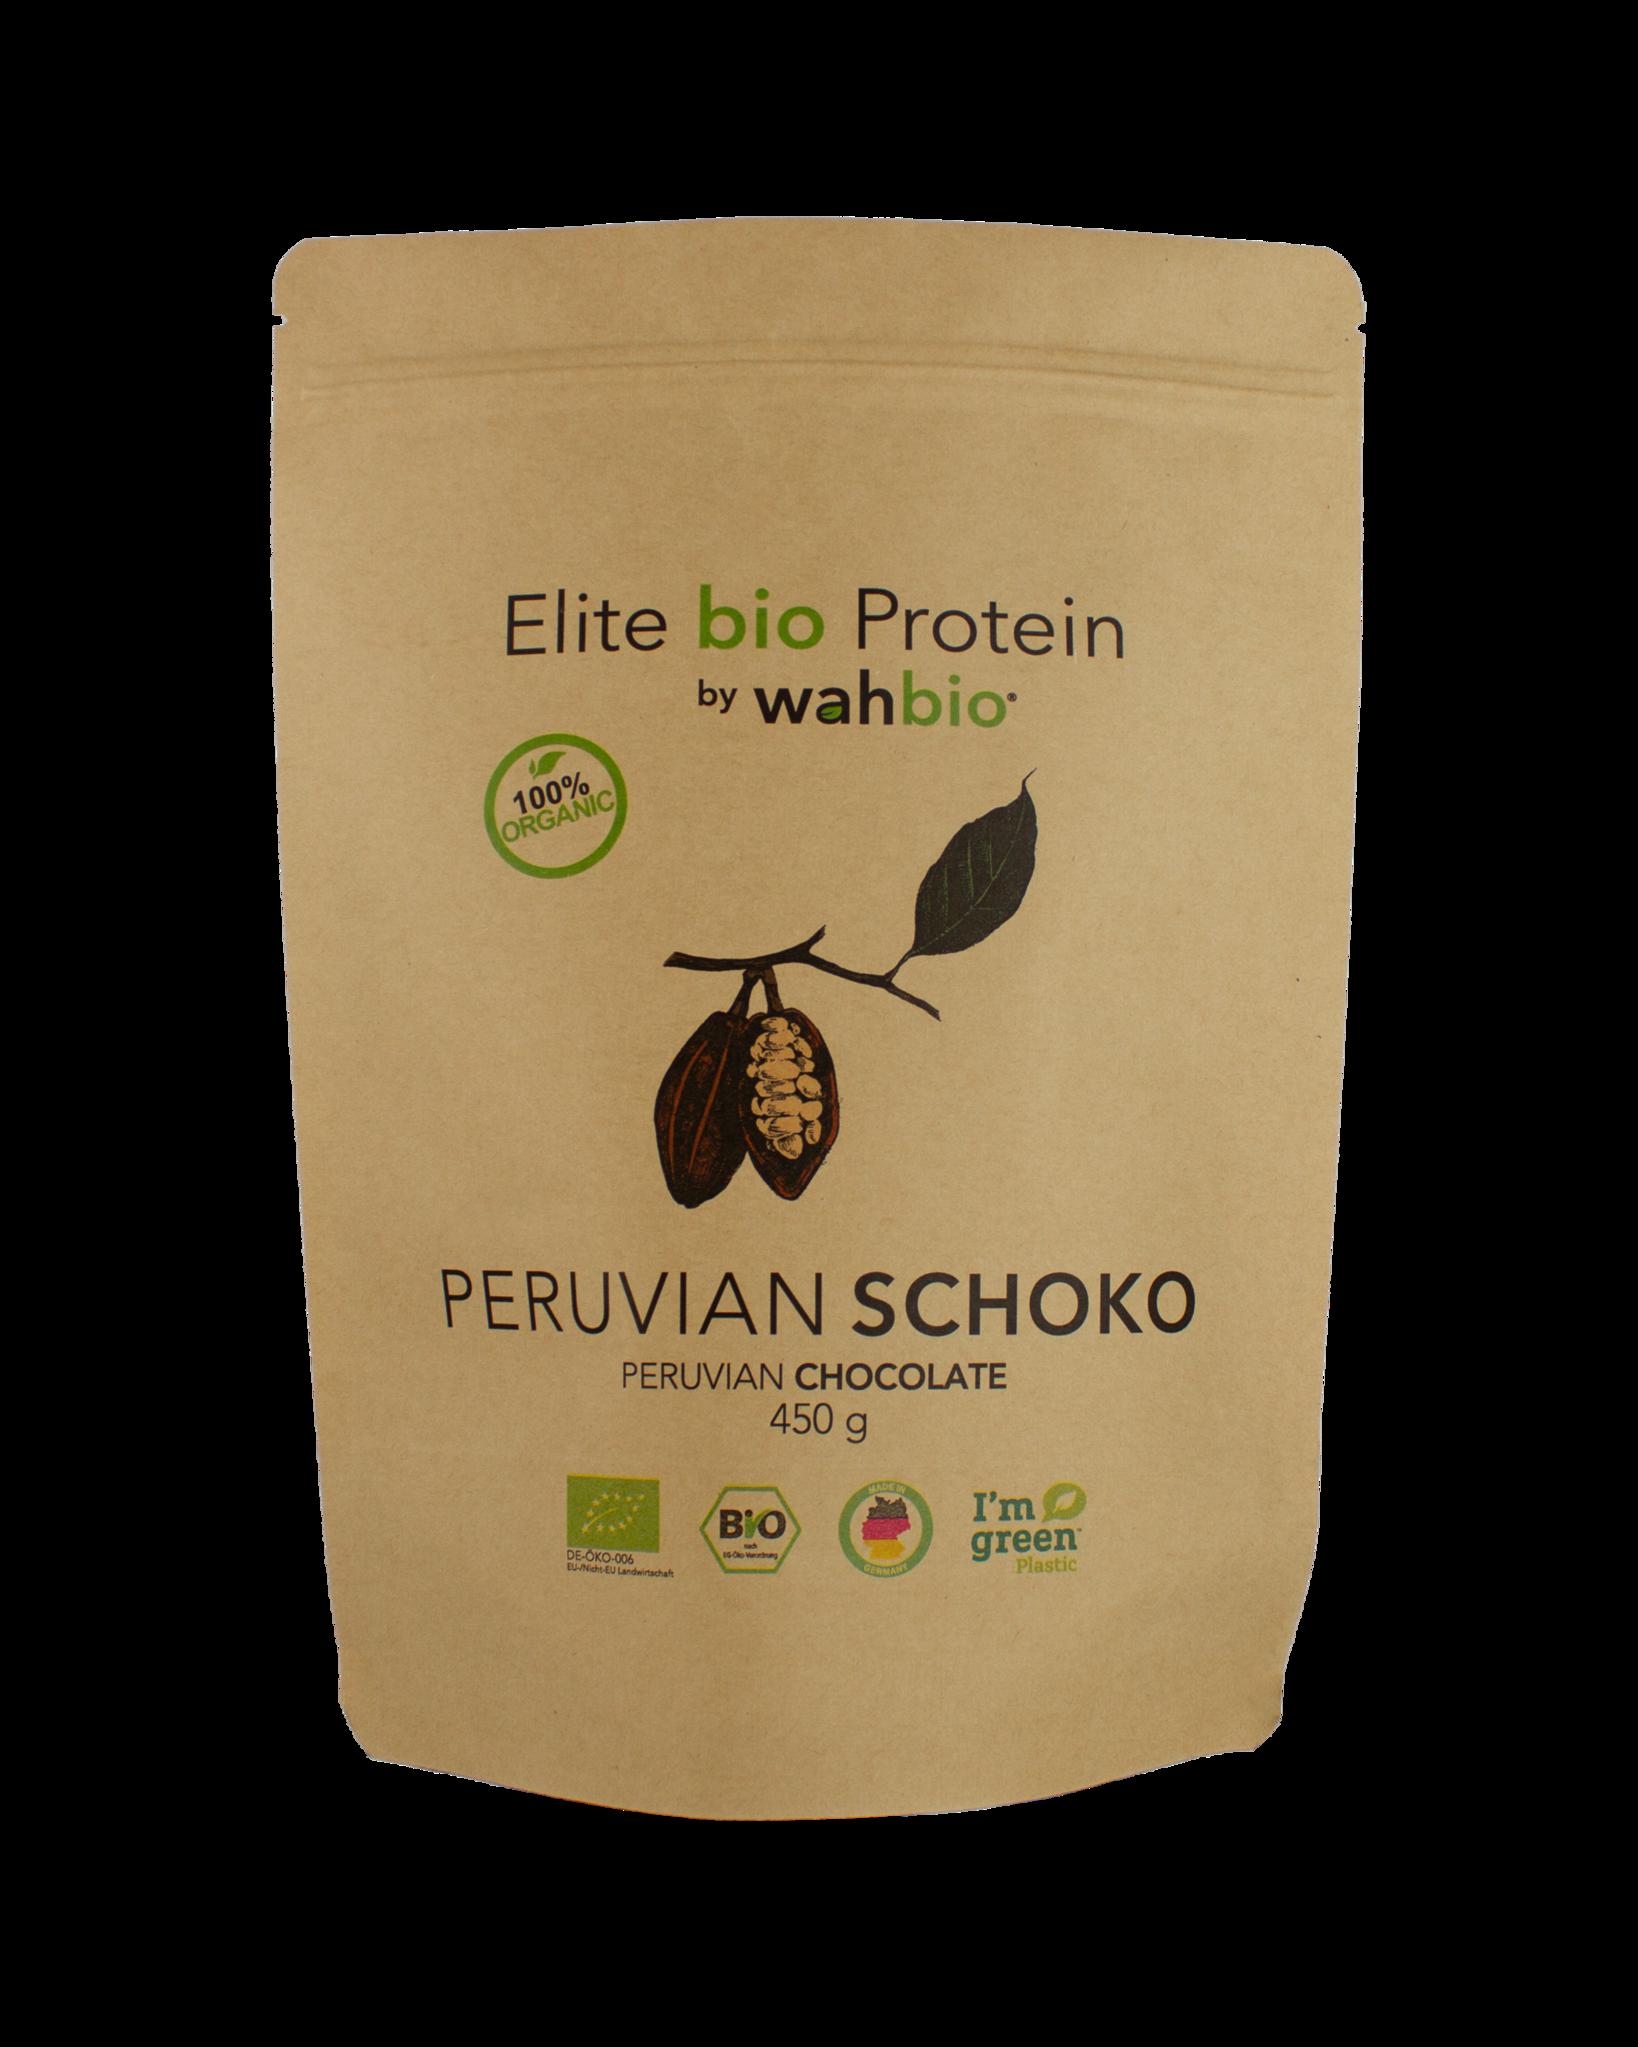 Elite bio Protein by wahbio | Peruvian Schoko | 450 Gr - Copy